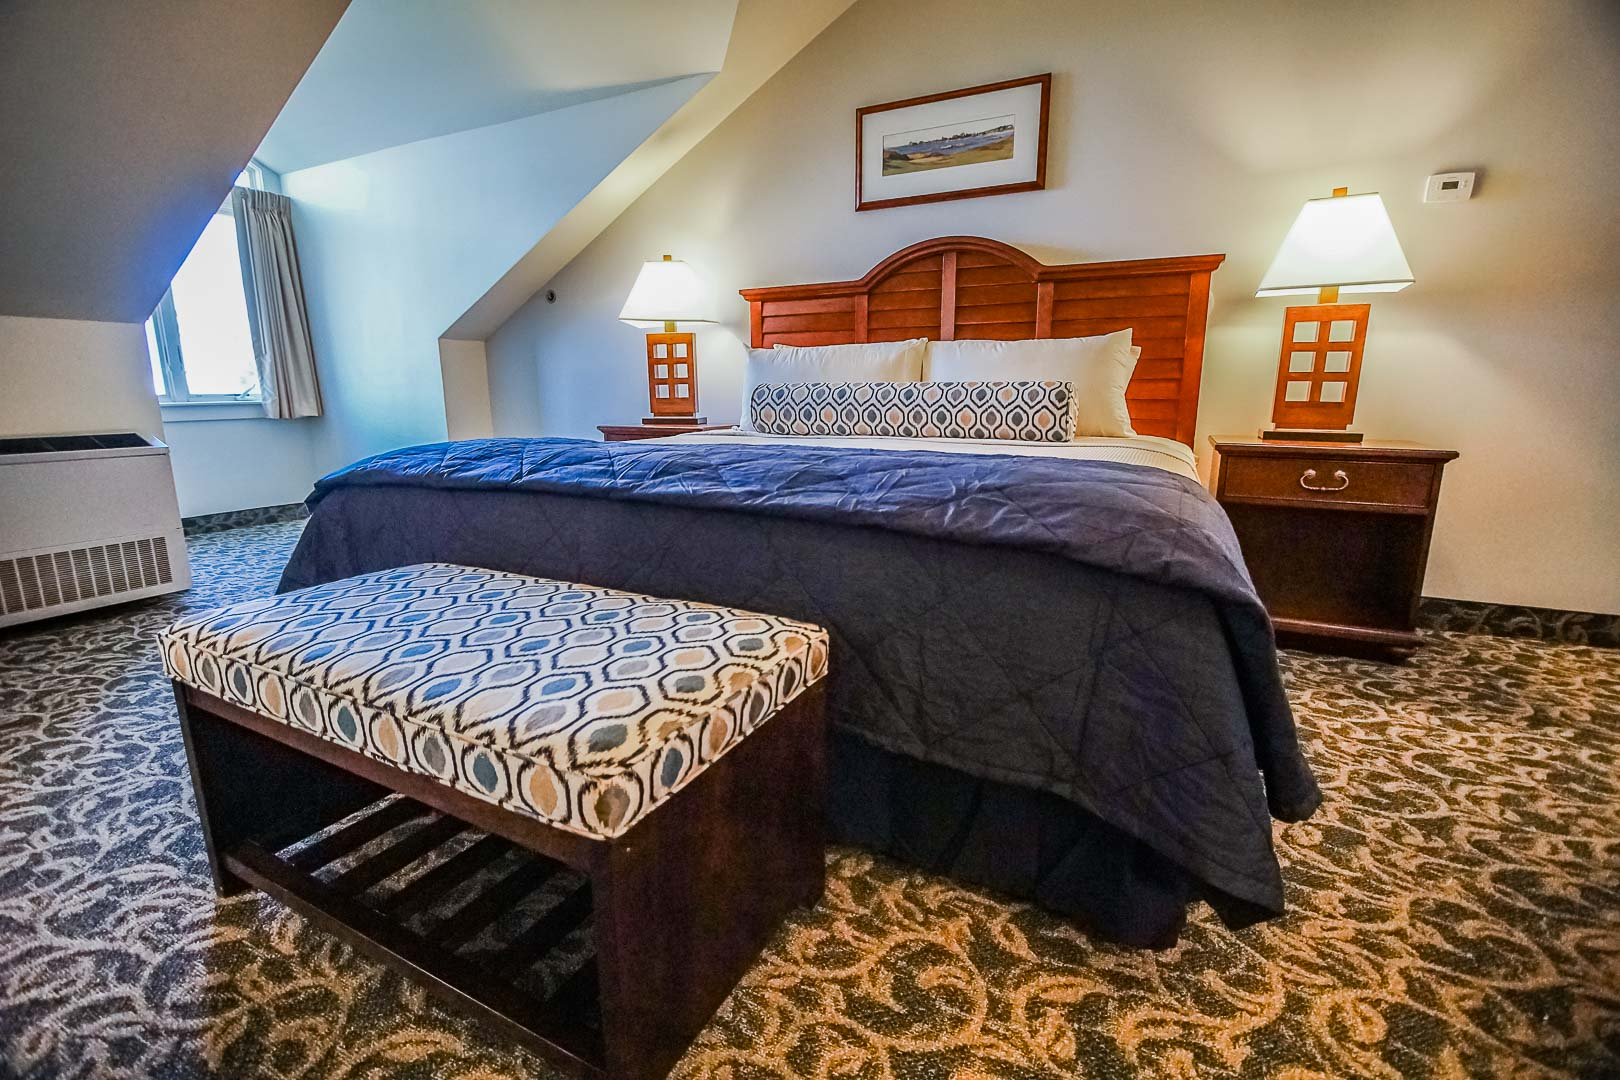 An expansive master bedroom at VRI's Oceancliff Resort in Rhode Island.